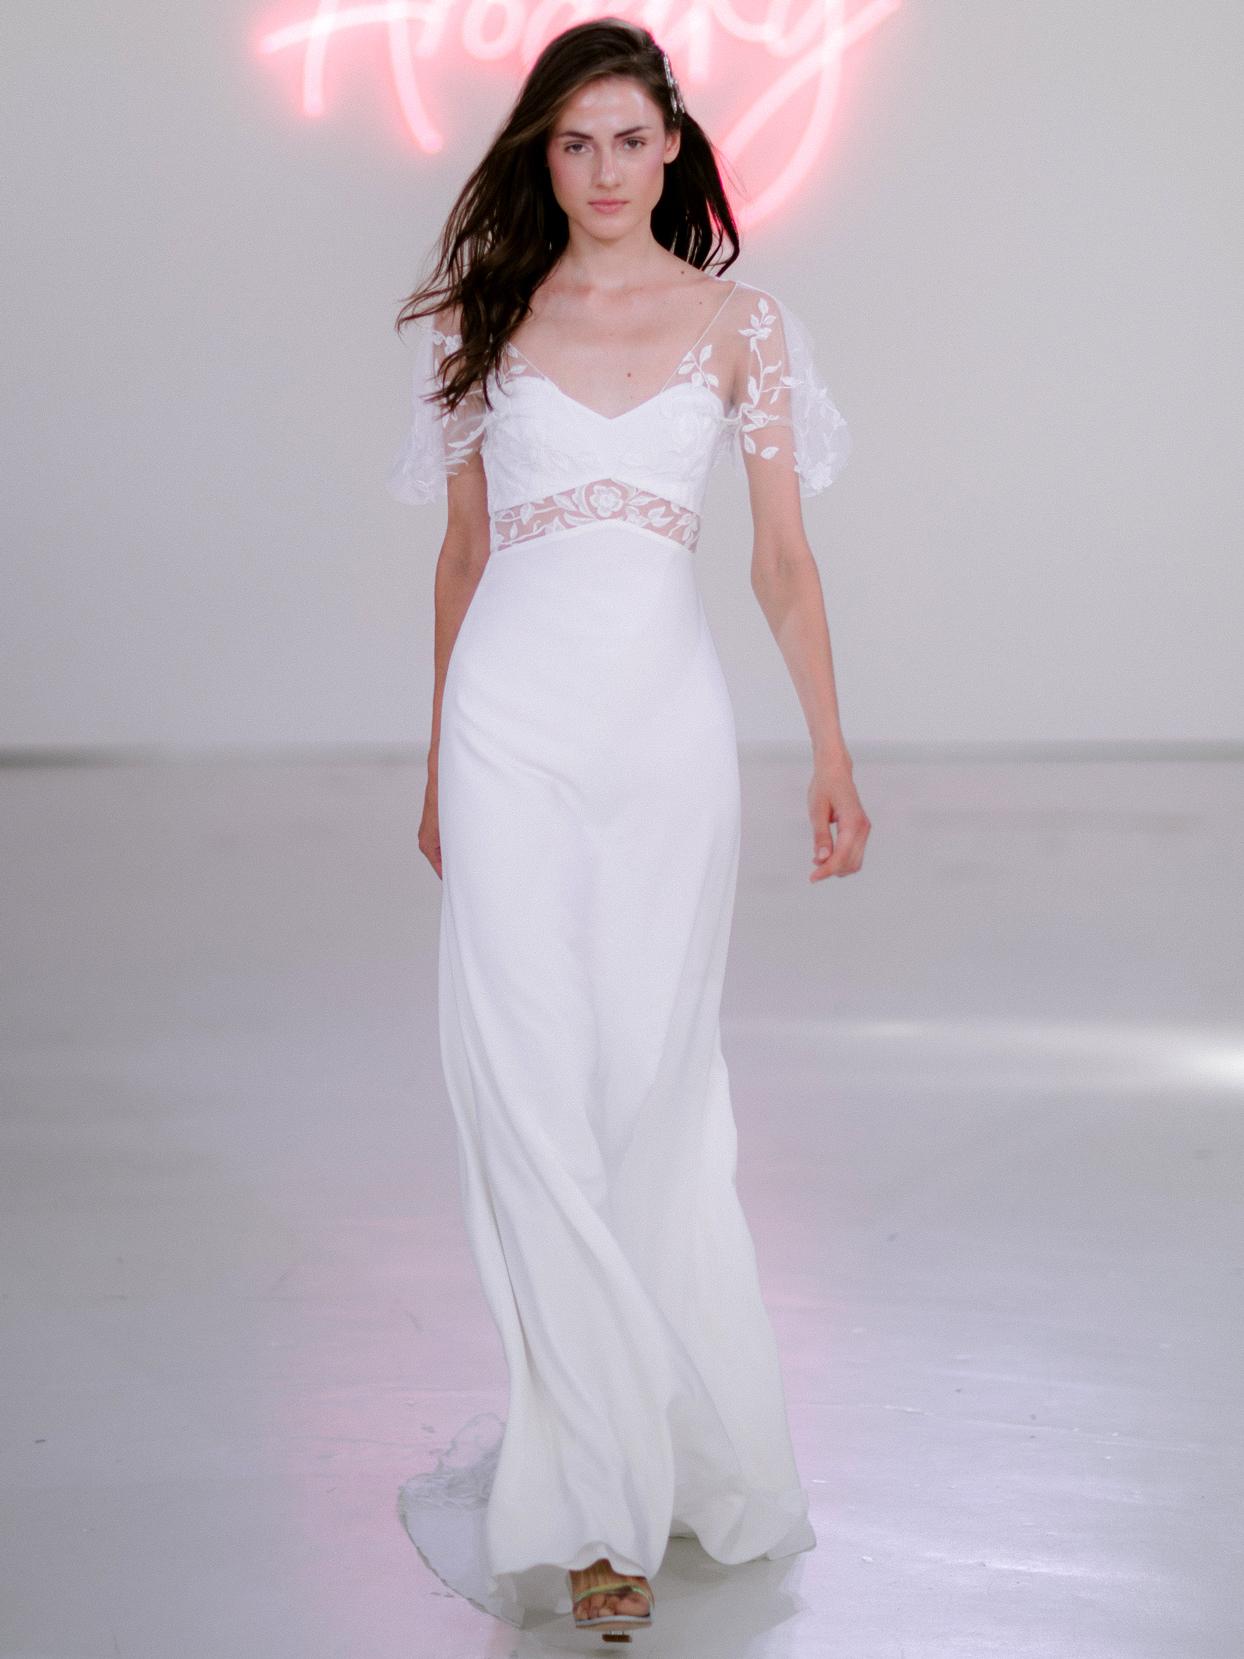 Rime Arodaky X The Mews Bridal semi-sweetheart lace flutter sleeve wedding dress fall 2020